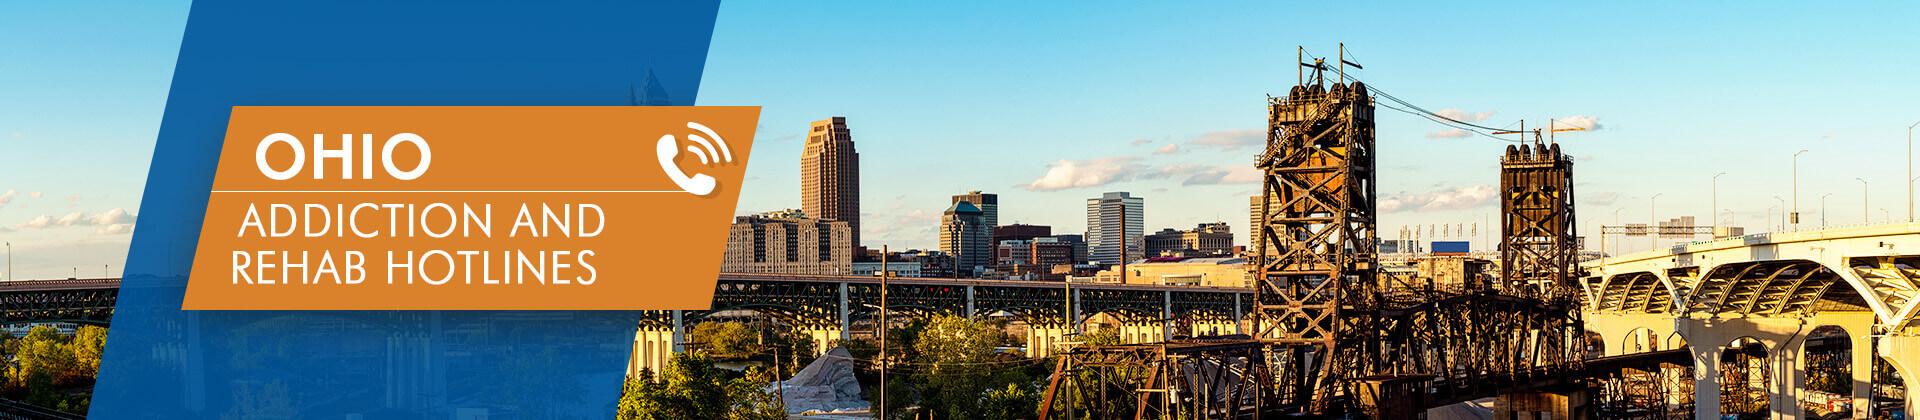 Ohio addiction and rehab hotlines